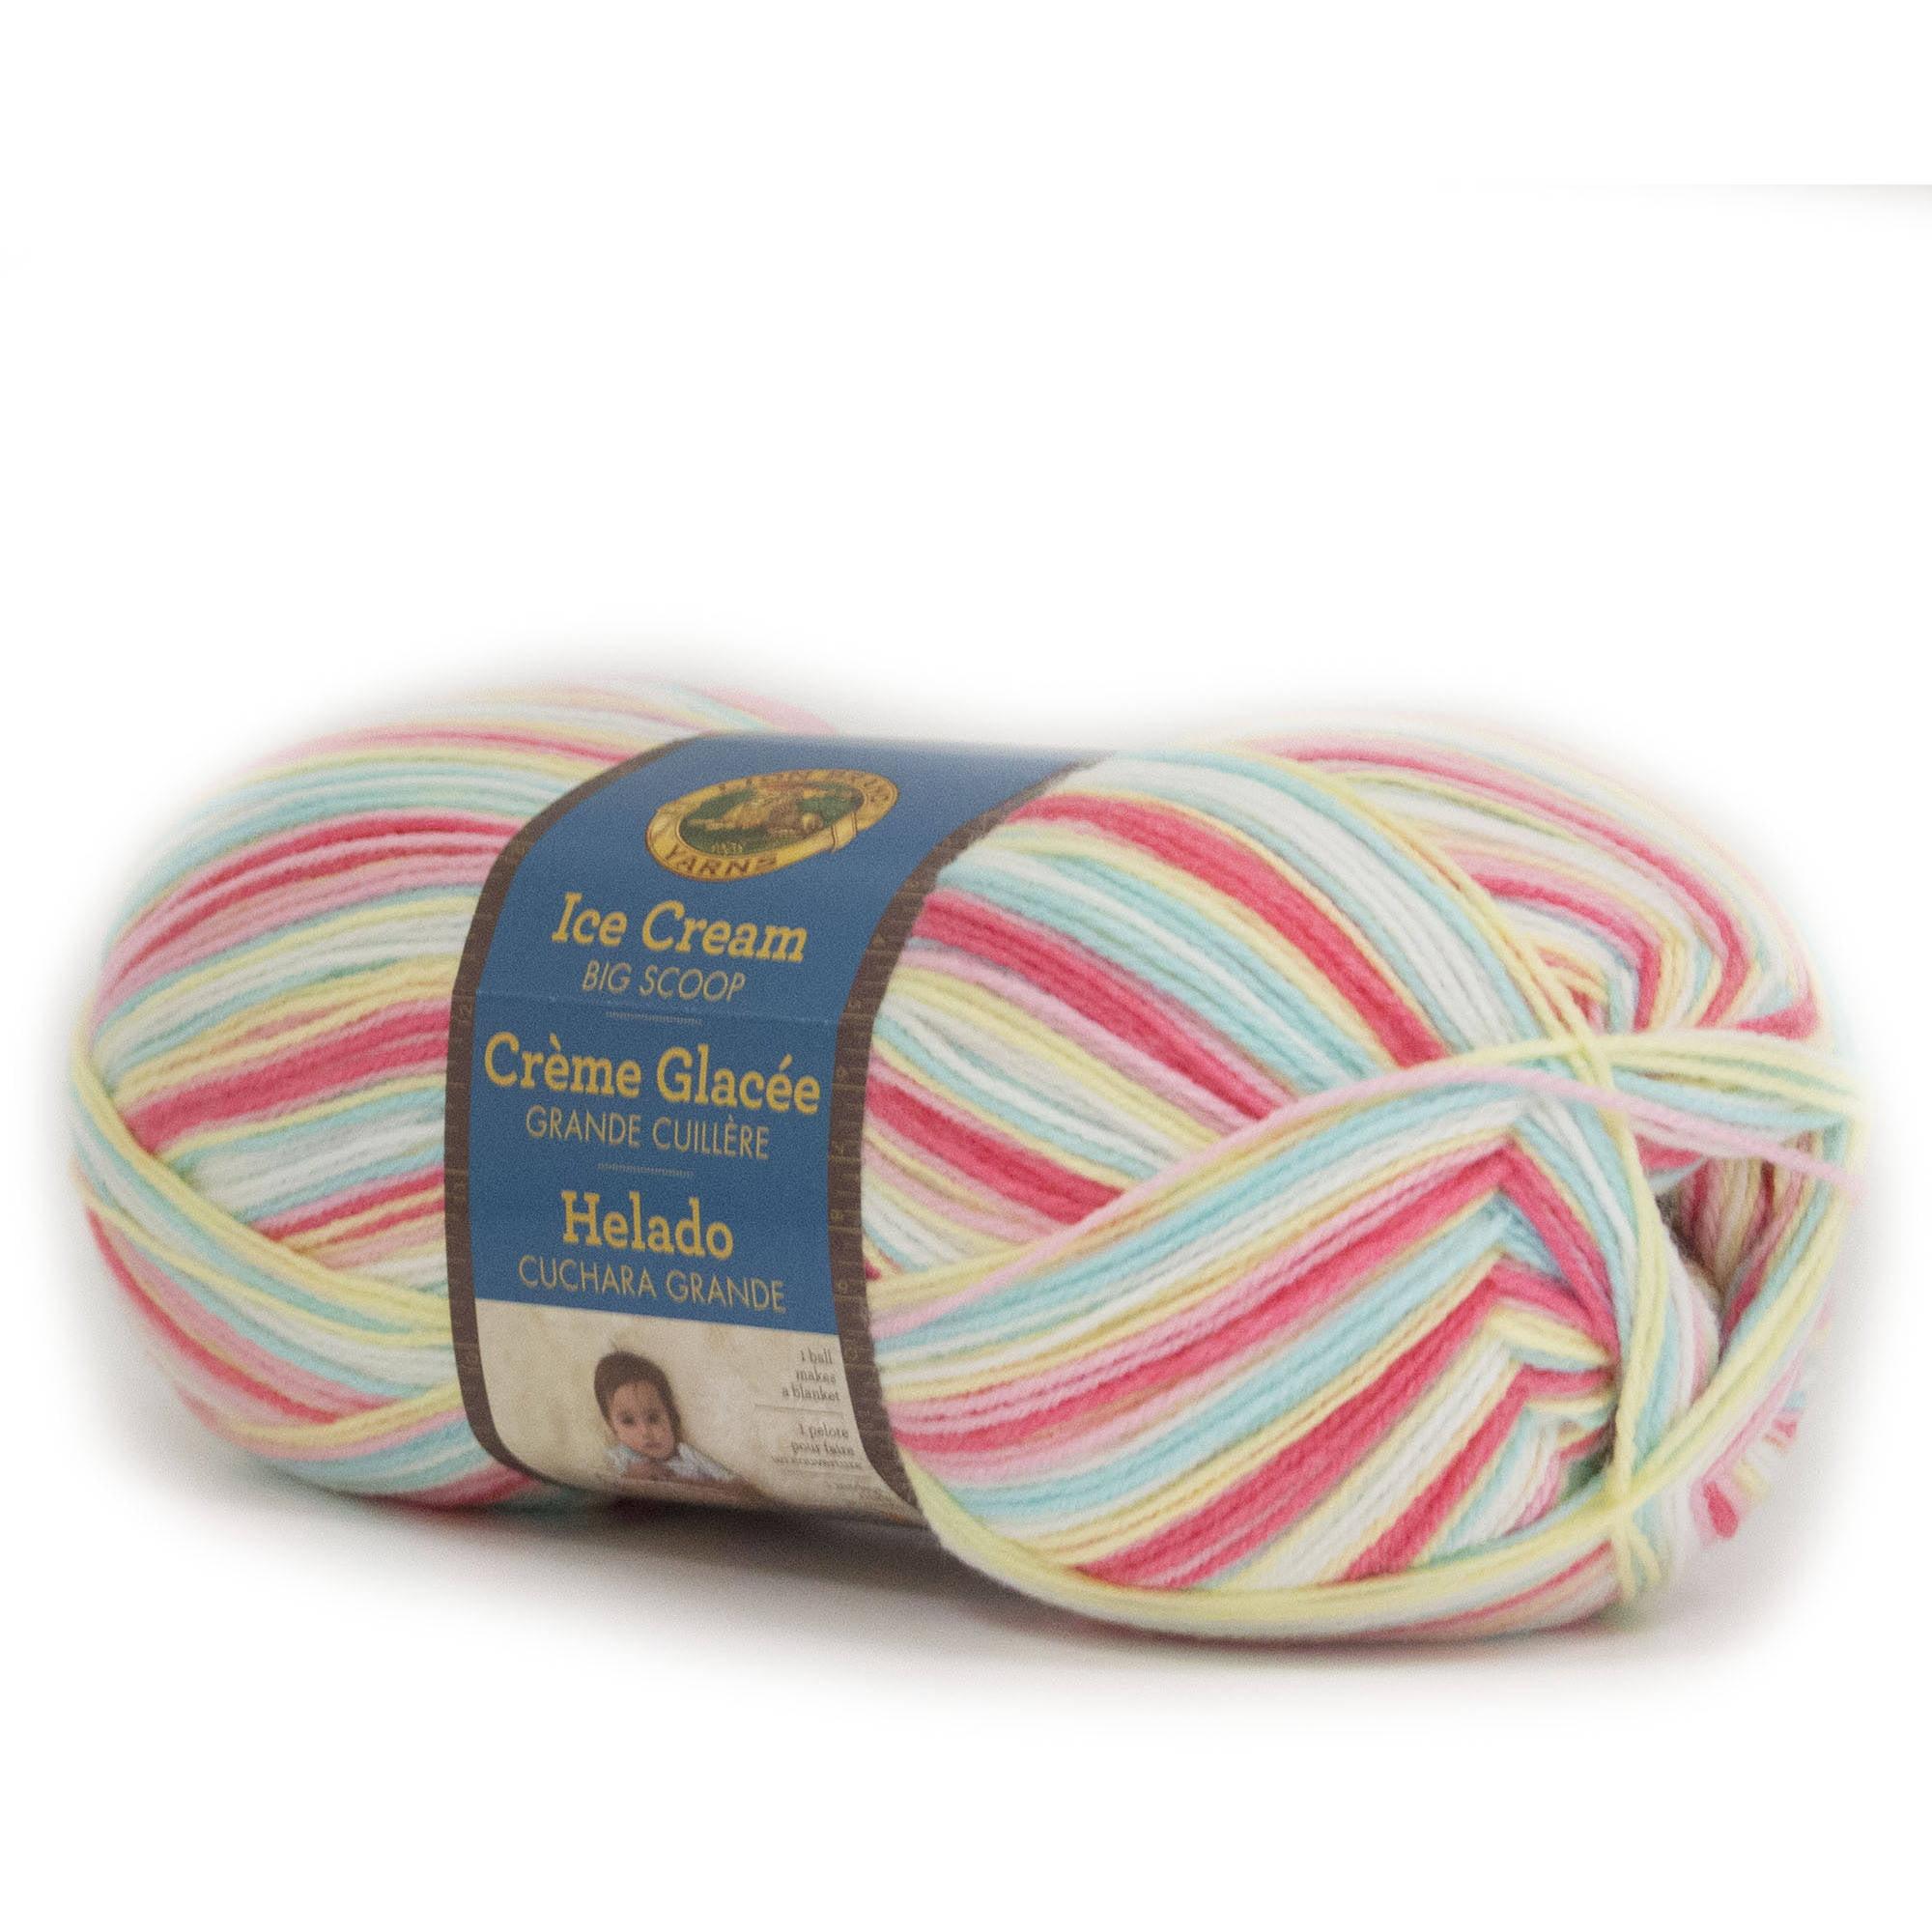 Lion Brand Yarn Ice Cream Big Scoop Single Skein Baby Yarn, Assorted Colors